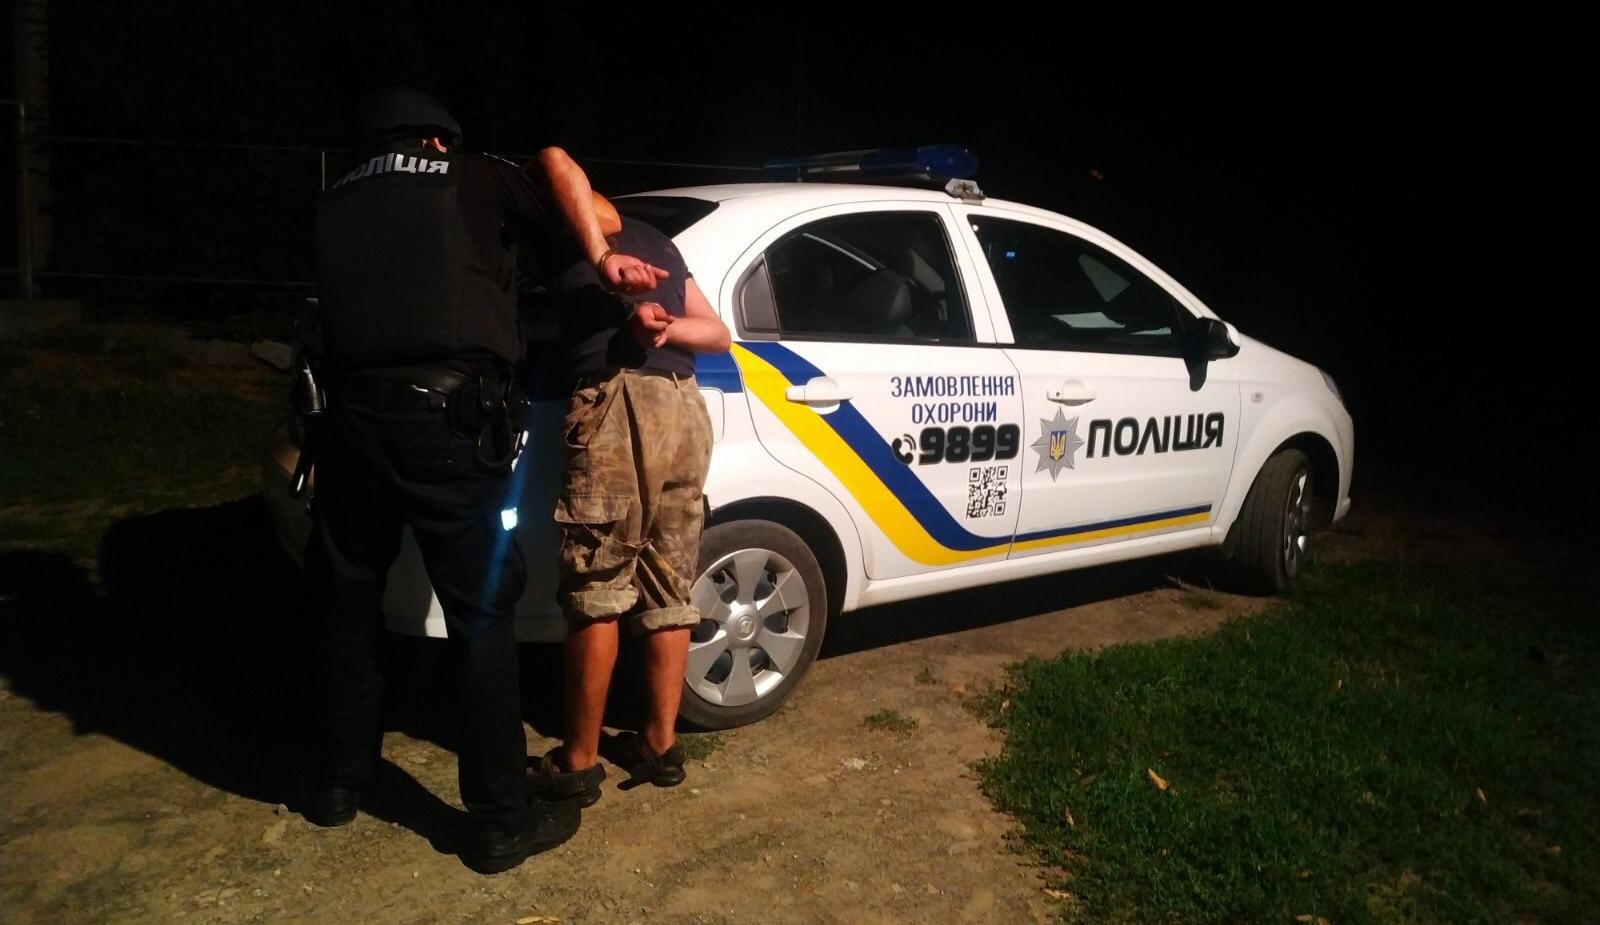 Черкащанин намагався незаконно потрапити на територію заводу